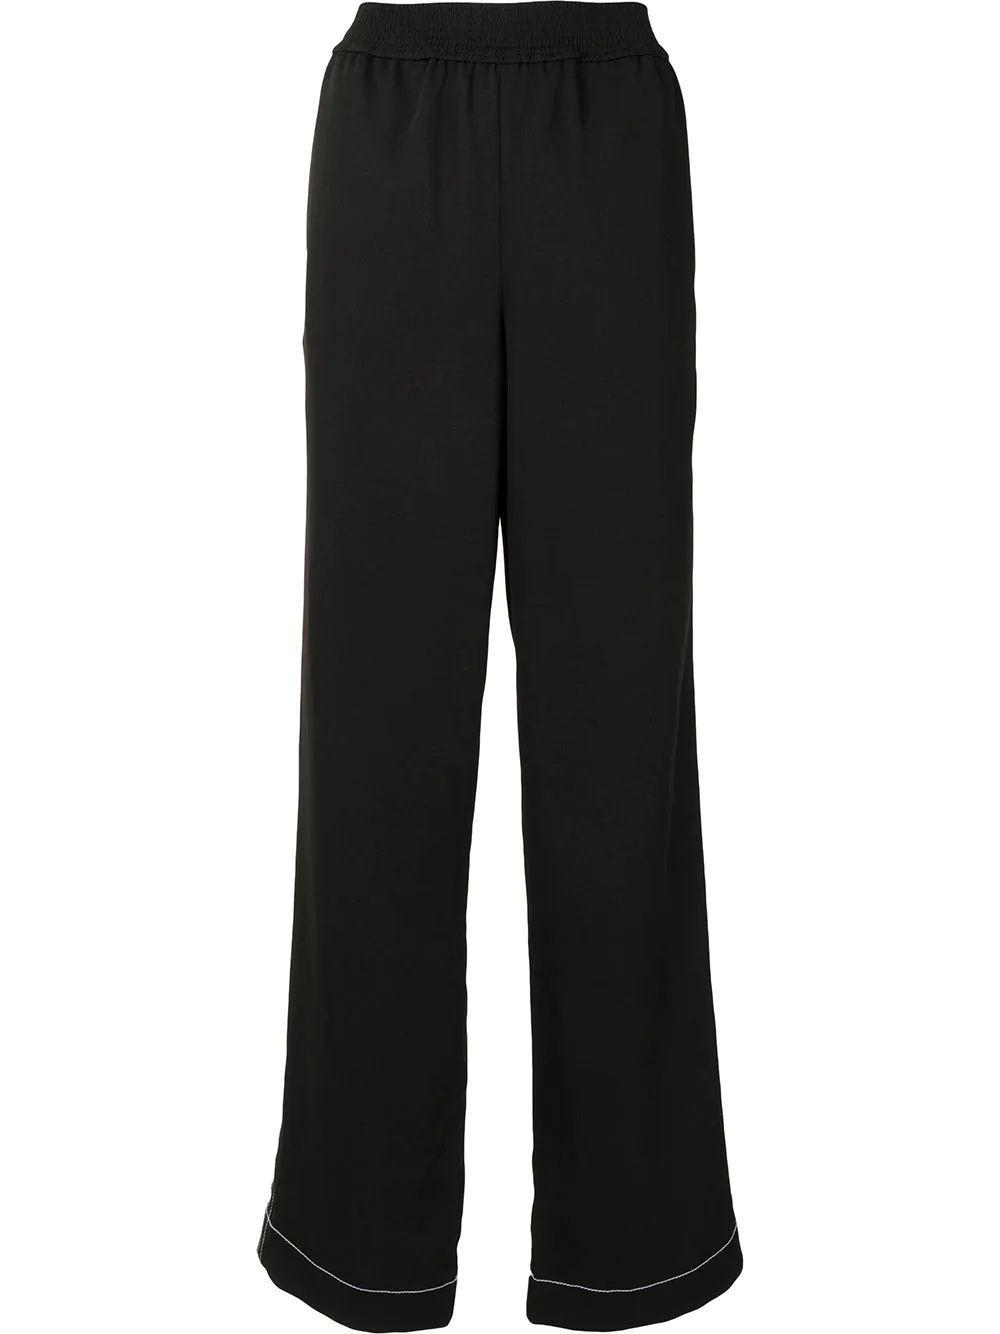 Contrast Stitch Pajama Pant